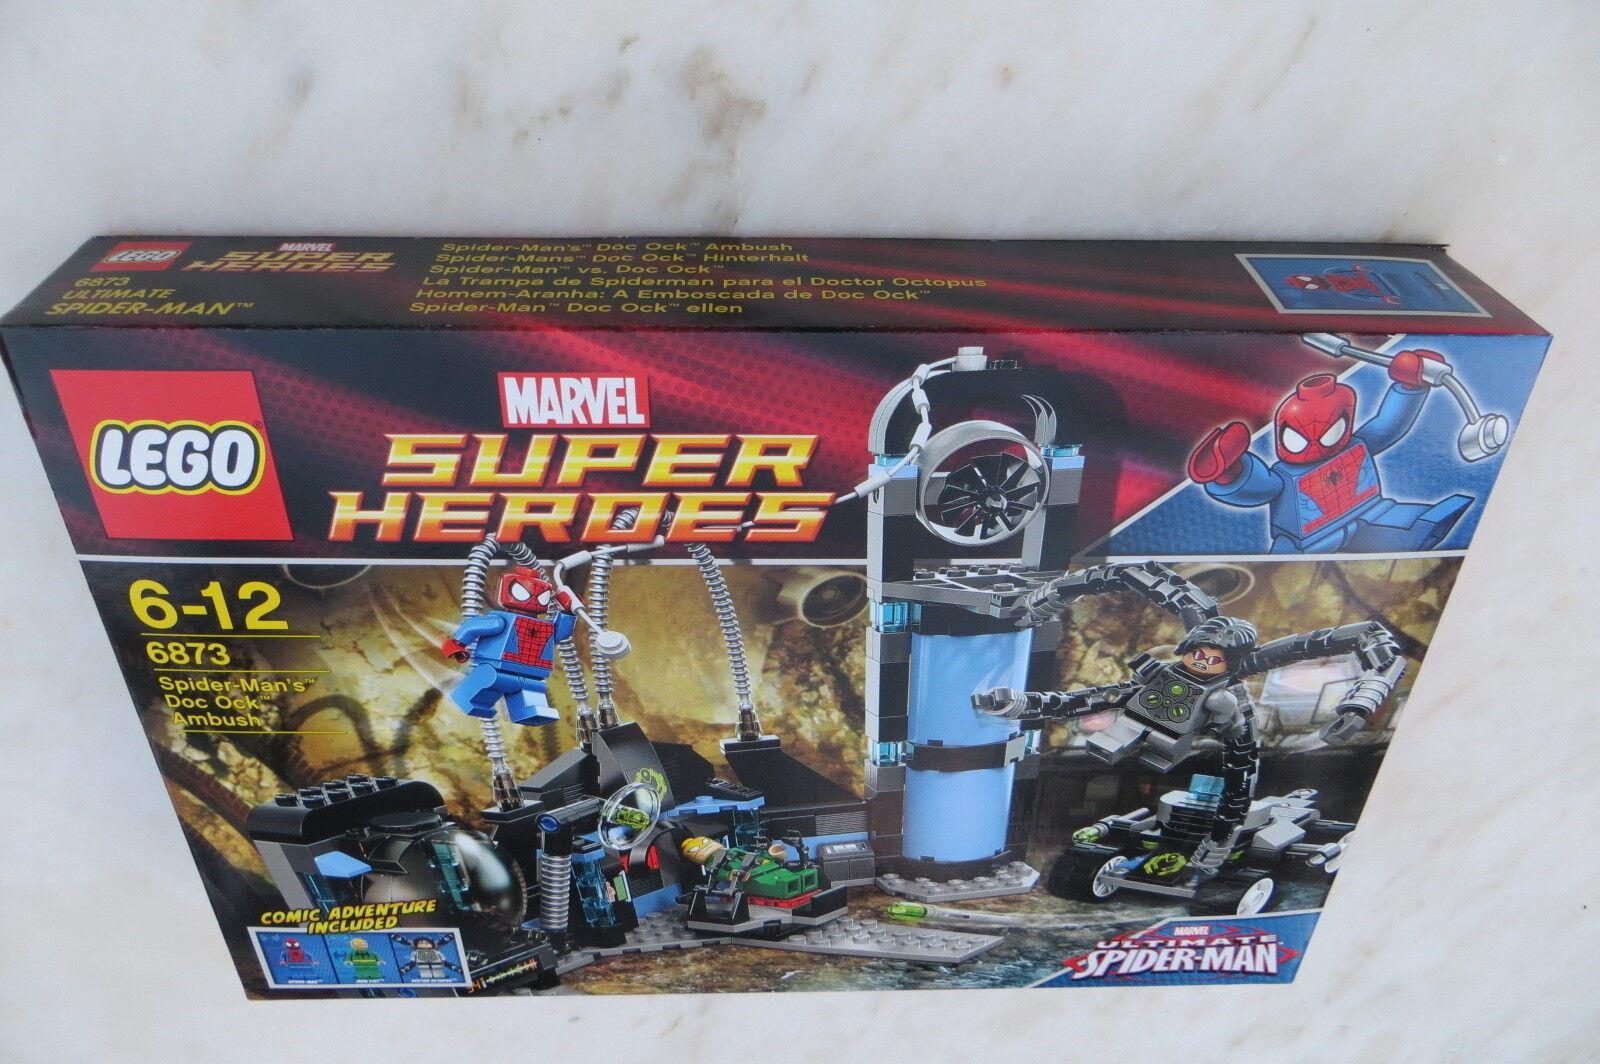 New  Sealed Super Heroes Lego 6873 Spider-Man's Doc Ock Ambush